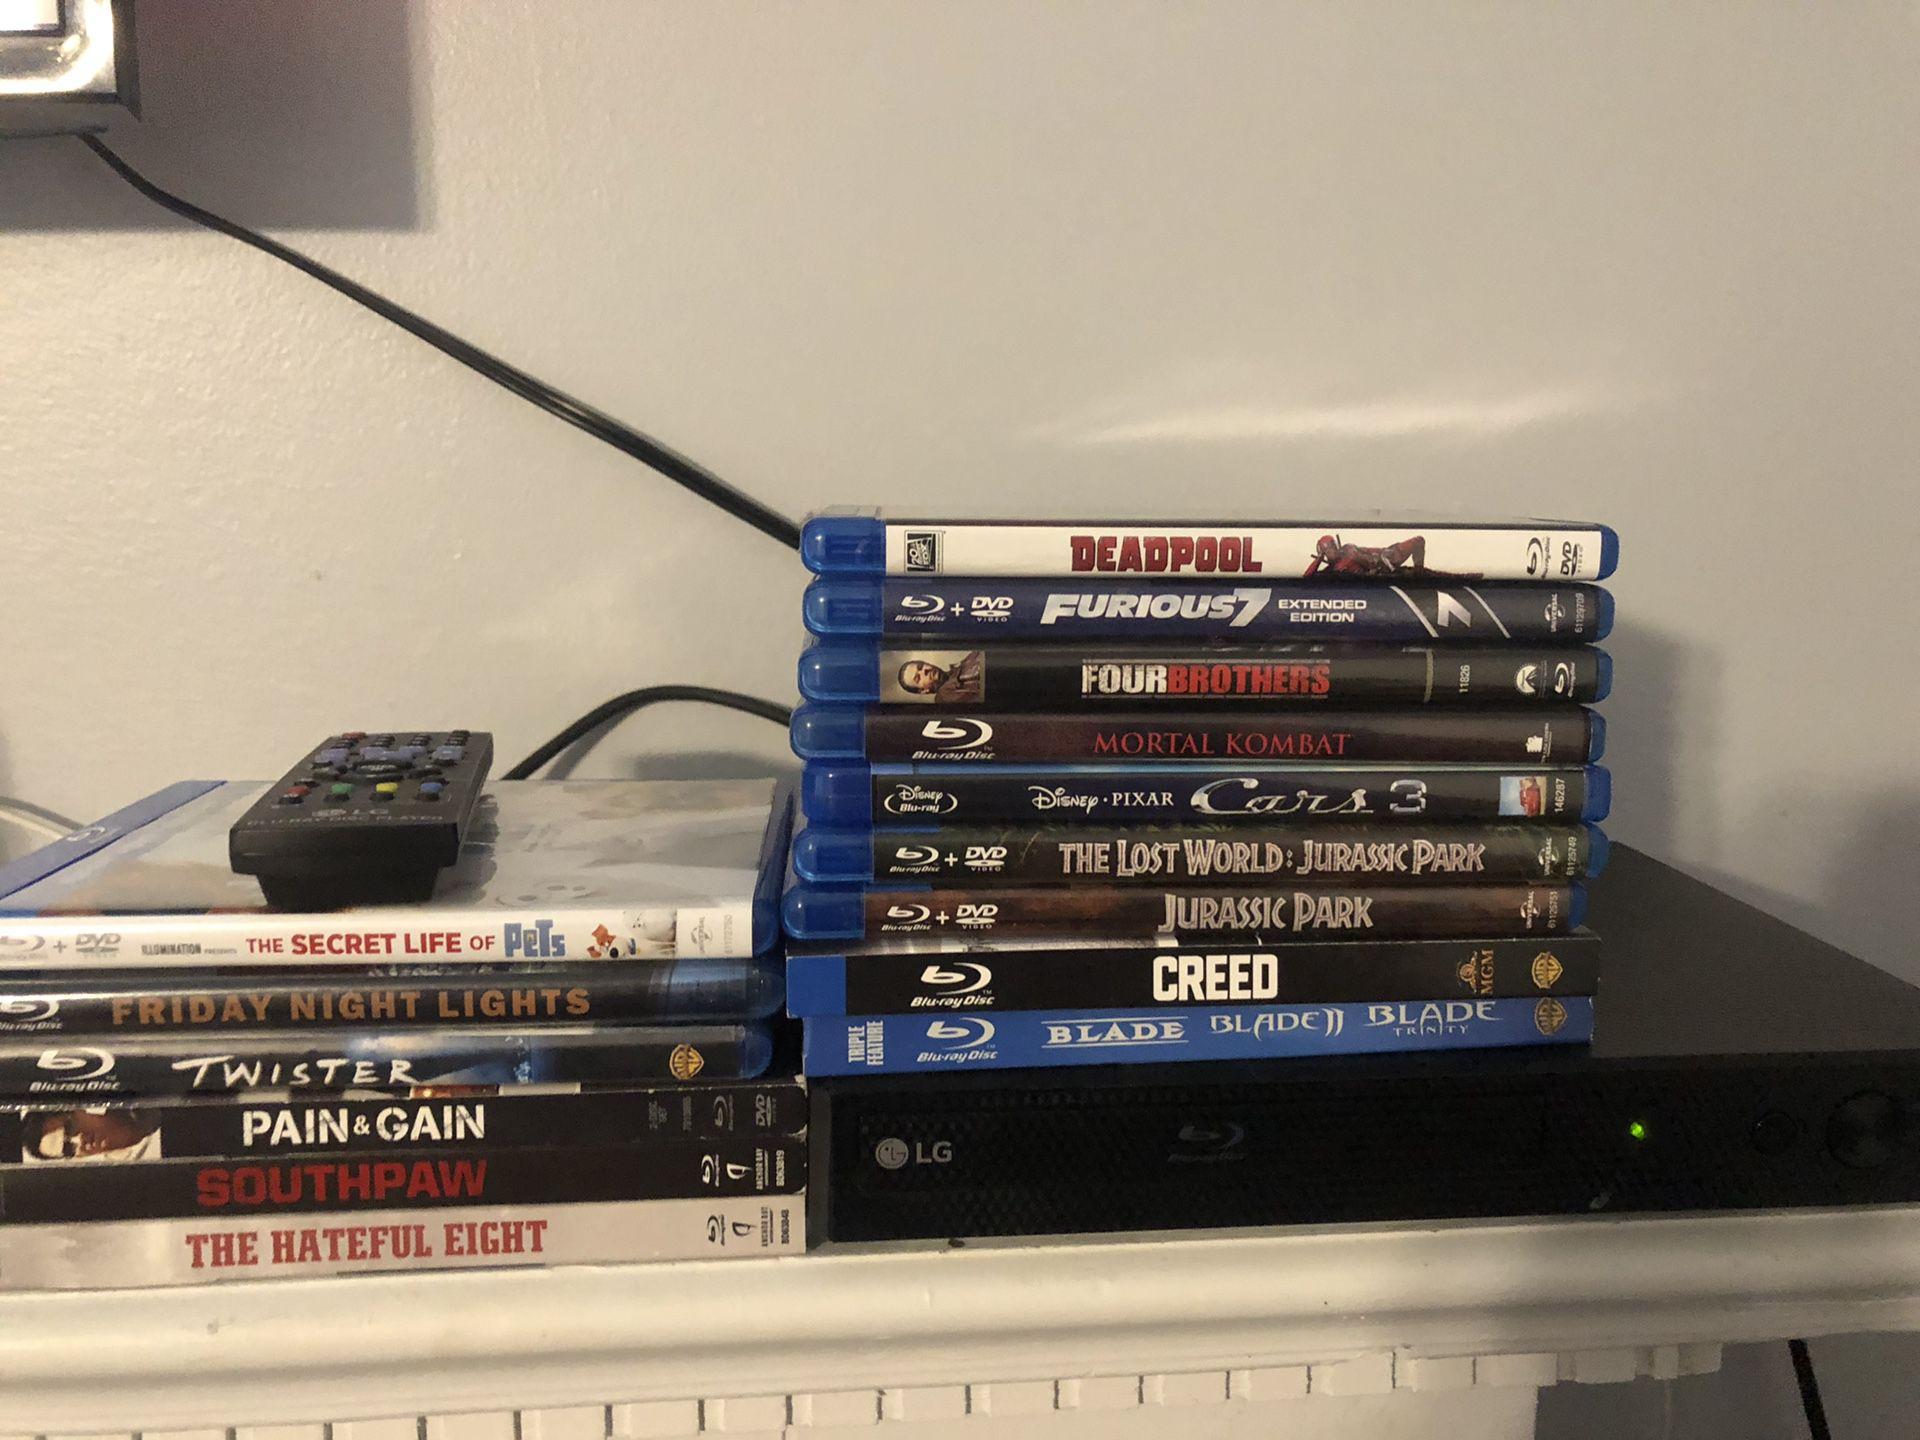 LG Blu-Ray Player & Blu-ray Movies